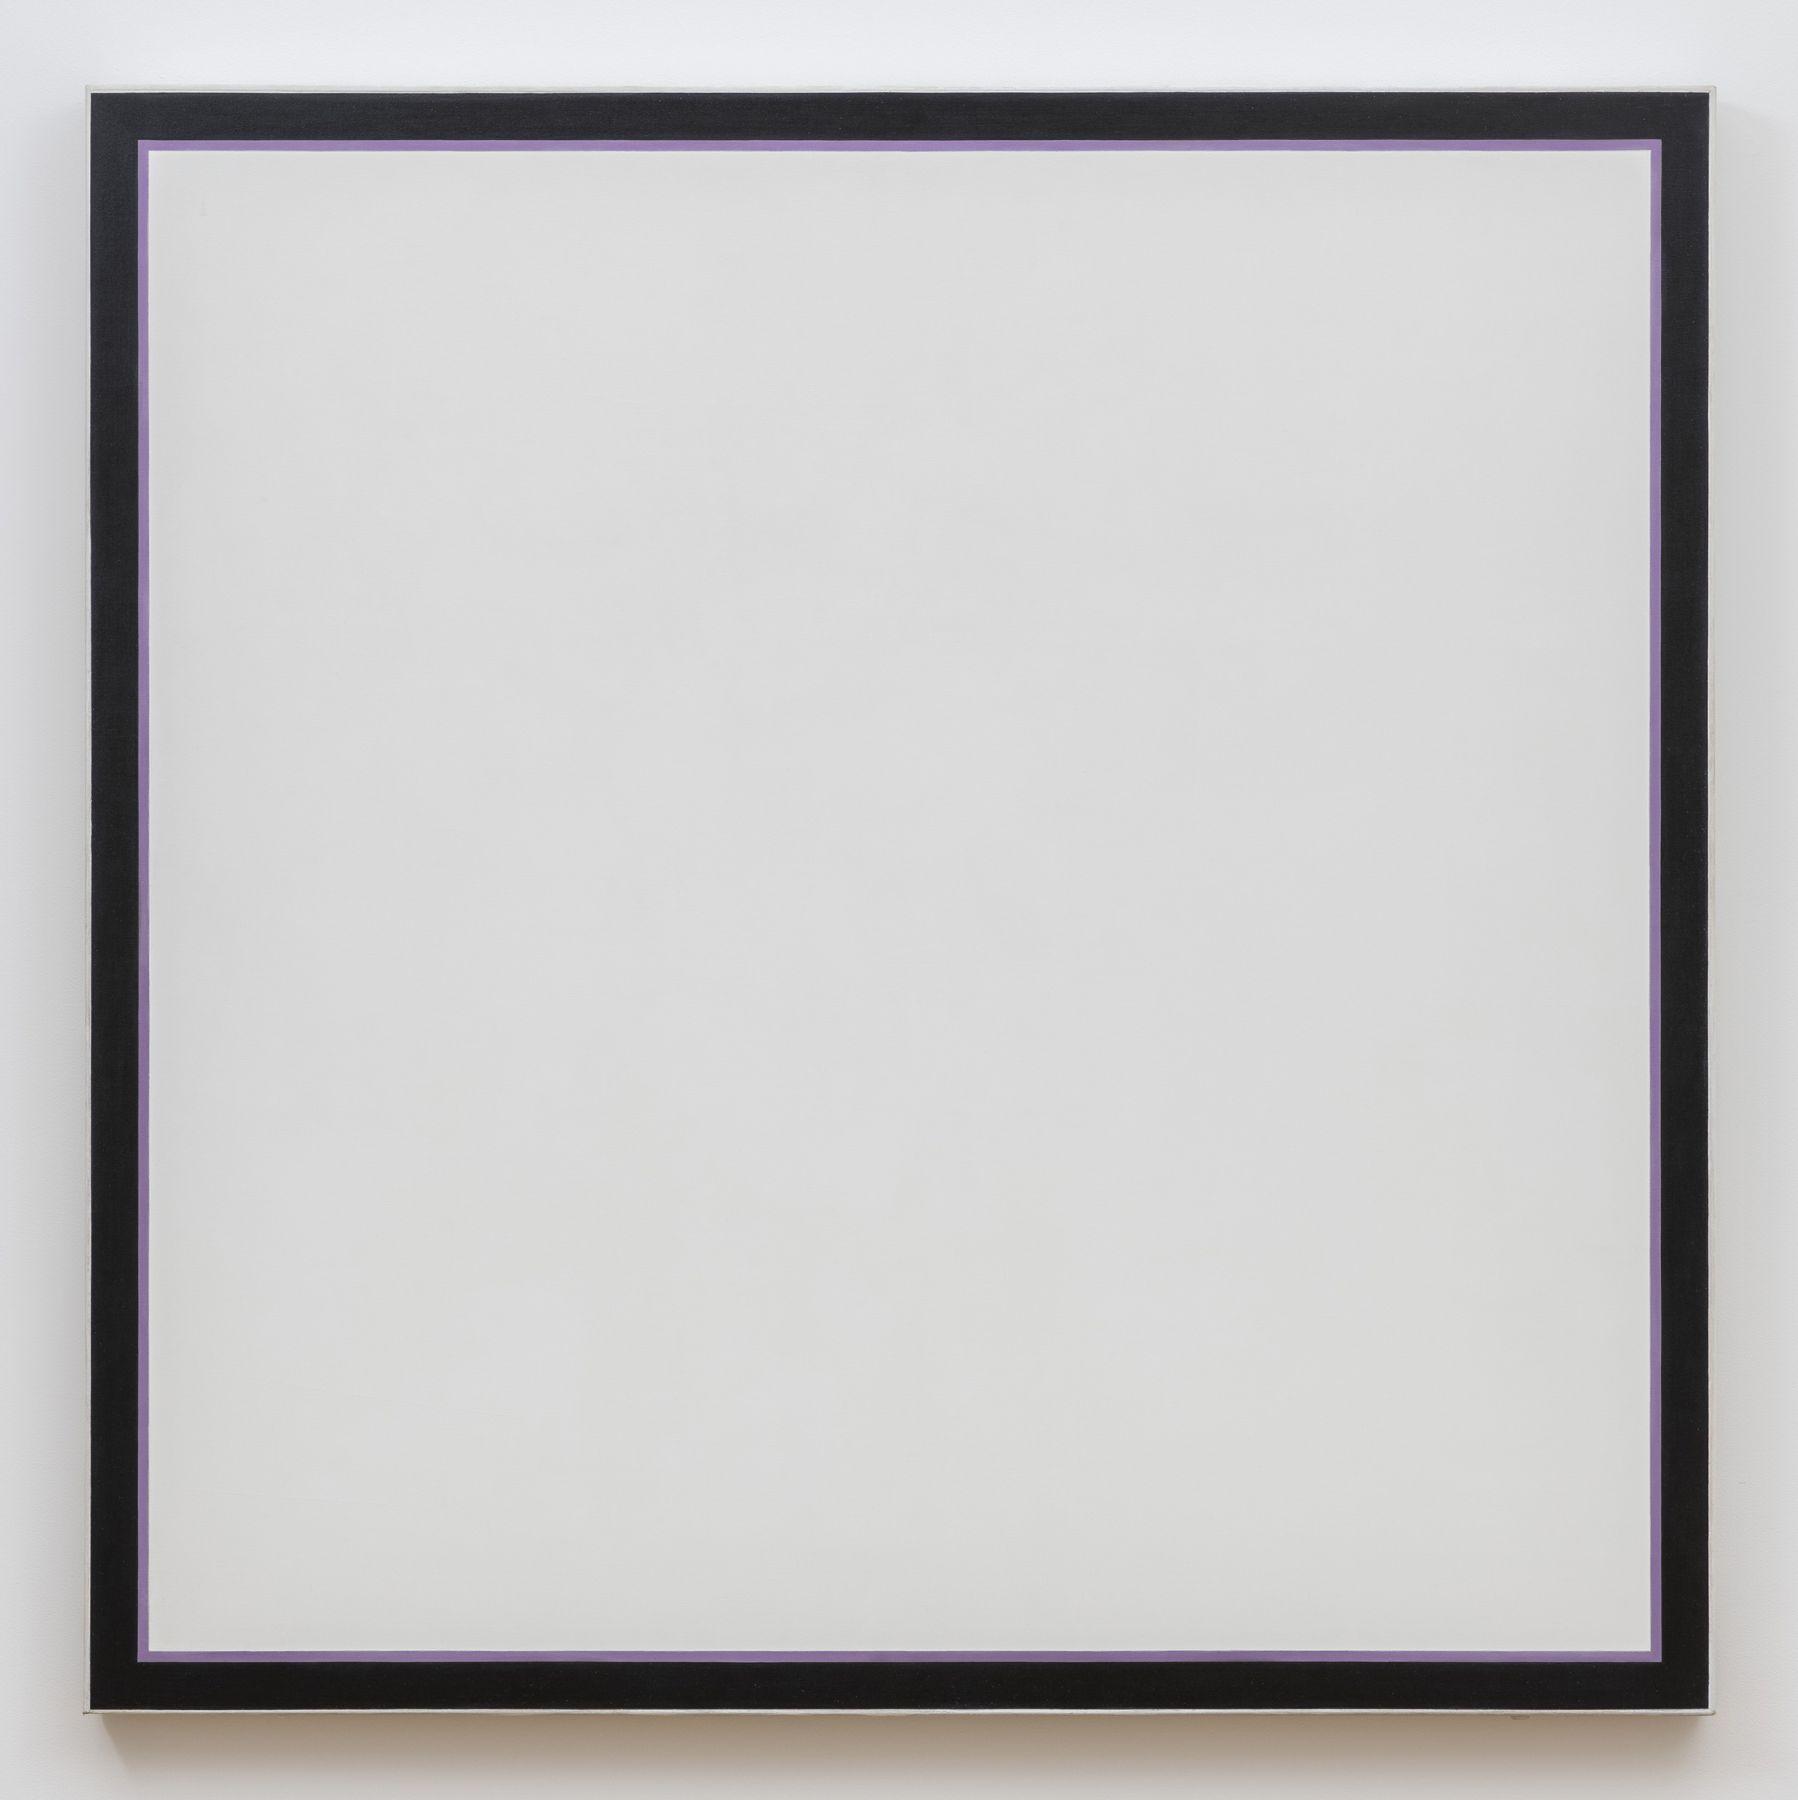 Jo Baer Untitled (White Square Lavender), 1964-1974